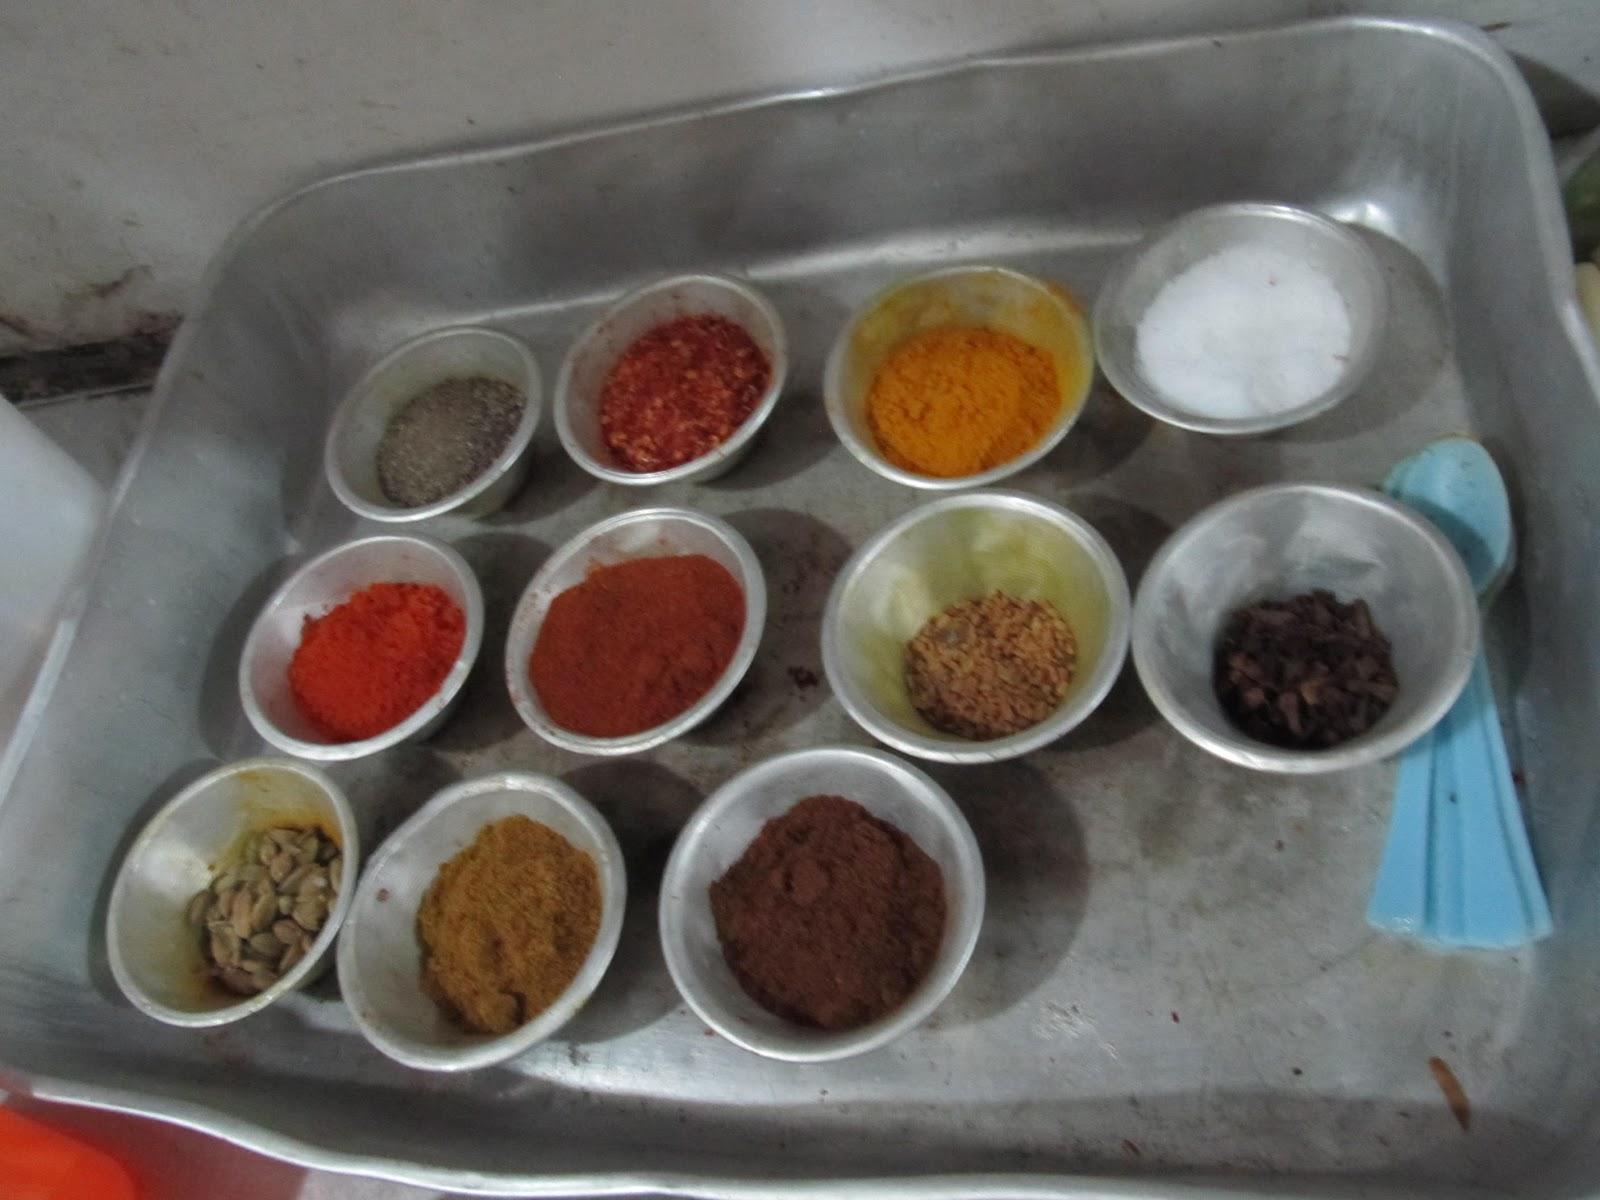 Ayurvedic cooking school canada for Ayurvedic cuisine